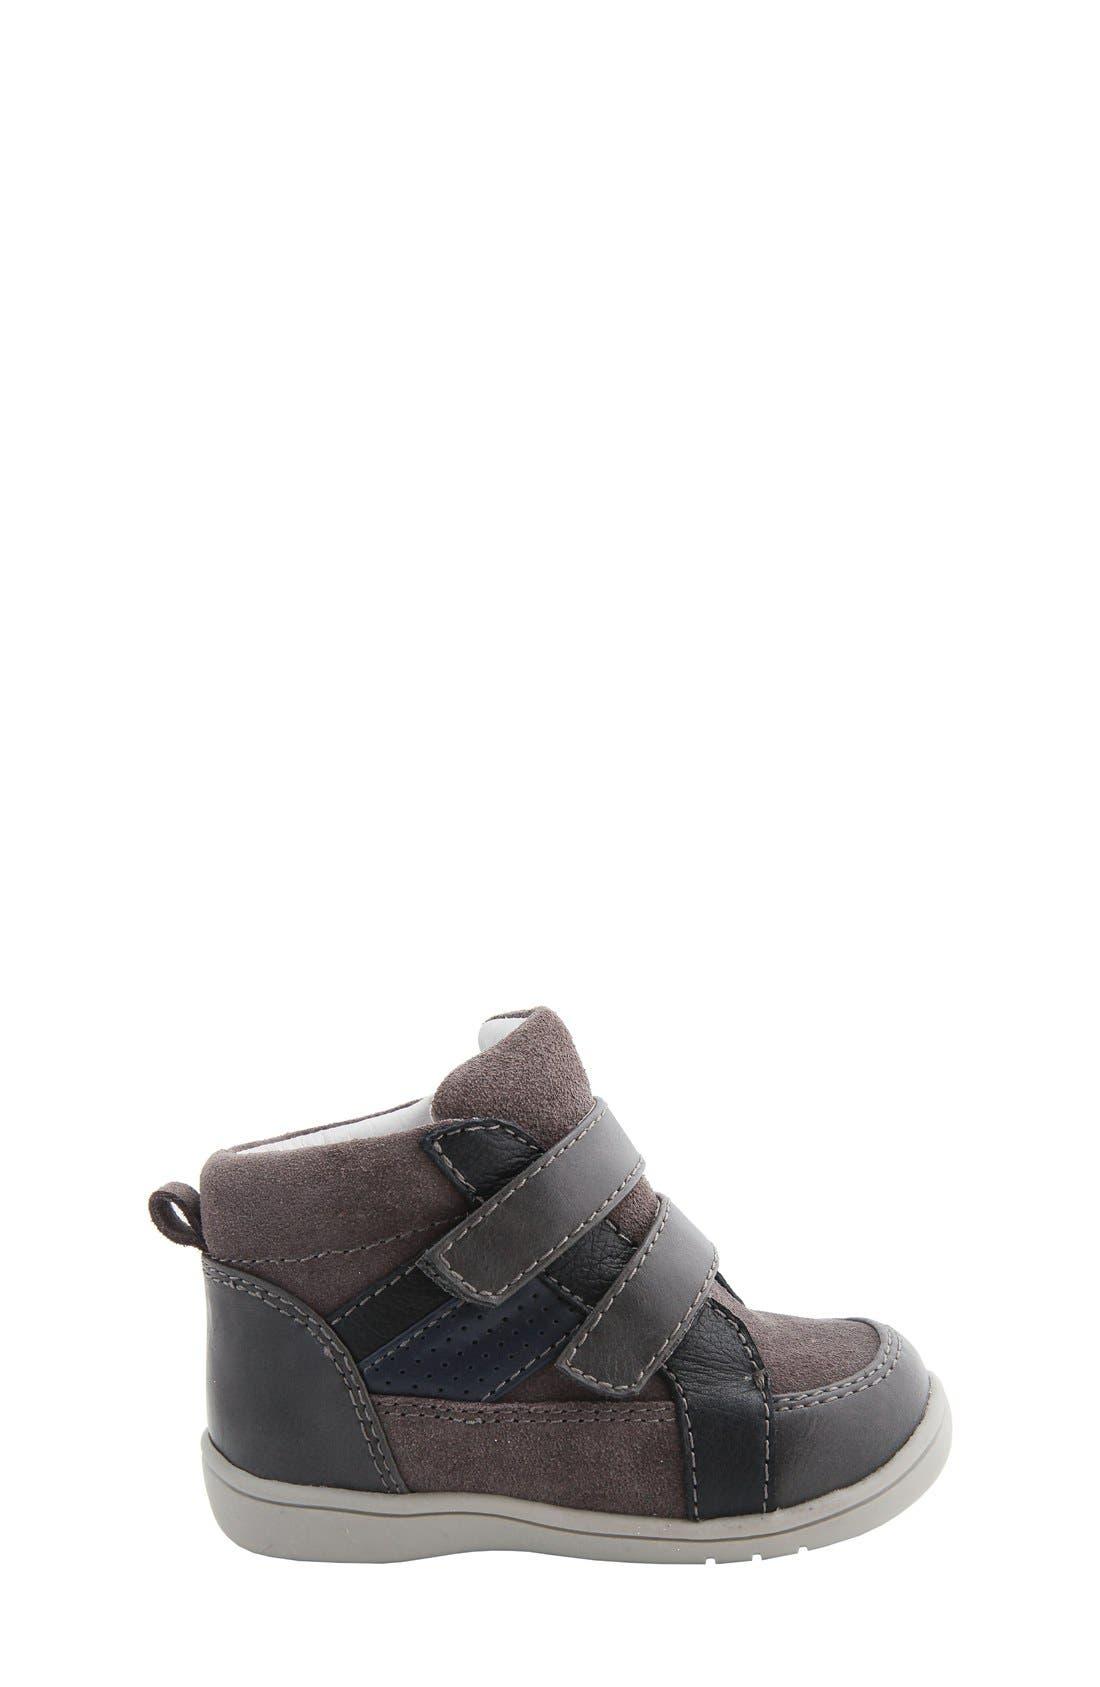 Nina 'Cairo' High Top Sneaker,                             Alternate thumbnail 6, color,                             064